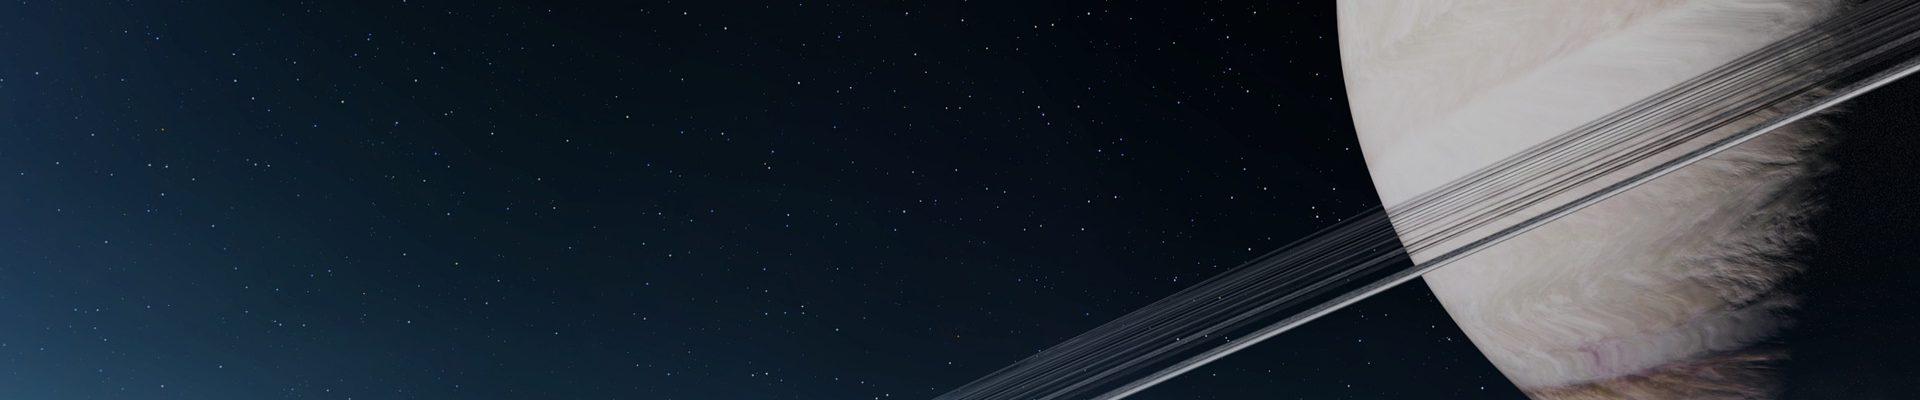 Saturn u Vodenjaku: Planet karme donosi 3 godine velikih iskušenja